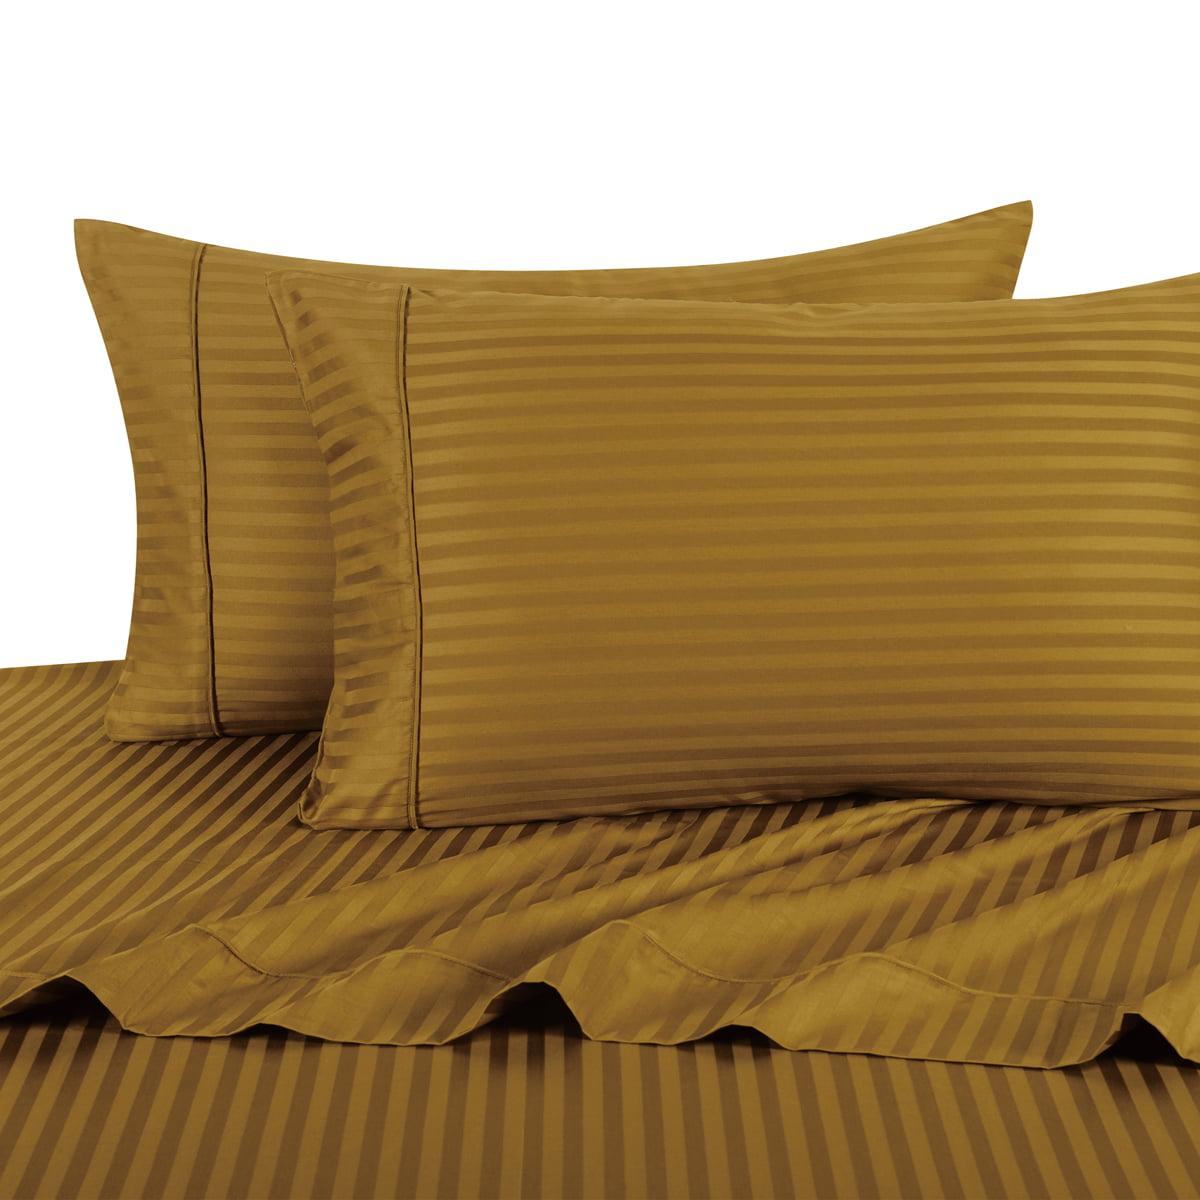 100% Cotton Sateen Bed Sheet Set 300 Thread Count Damask Striped - California King-Blush